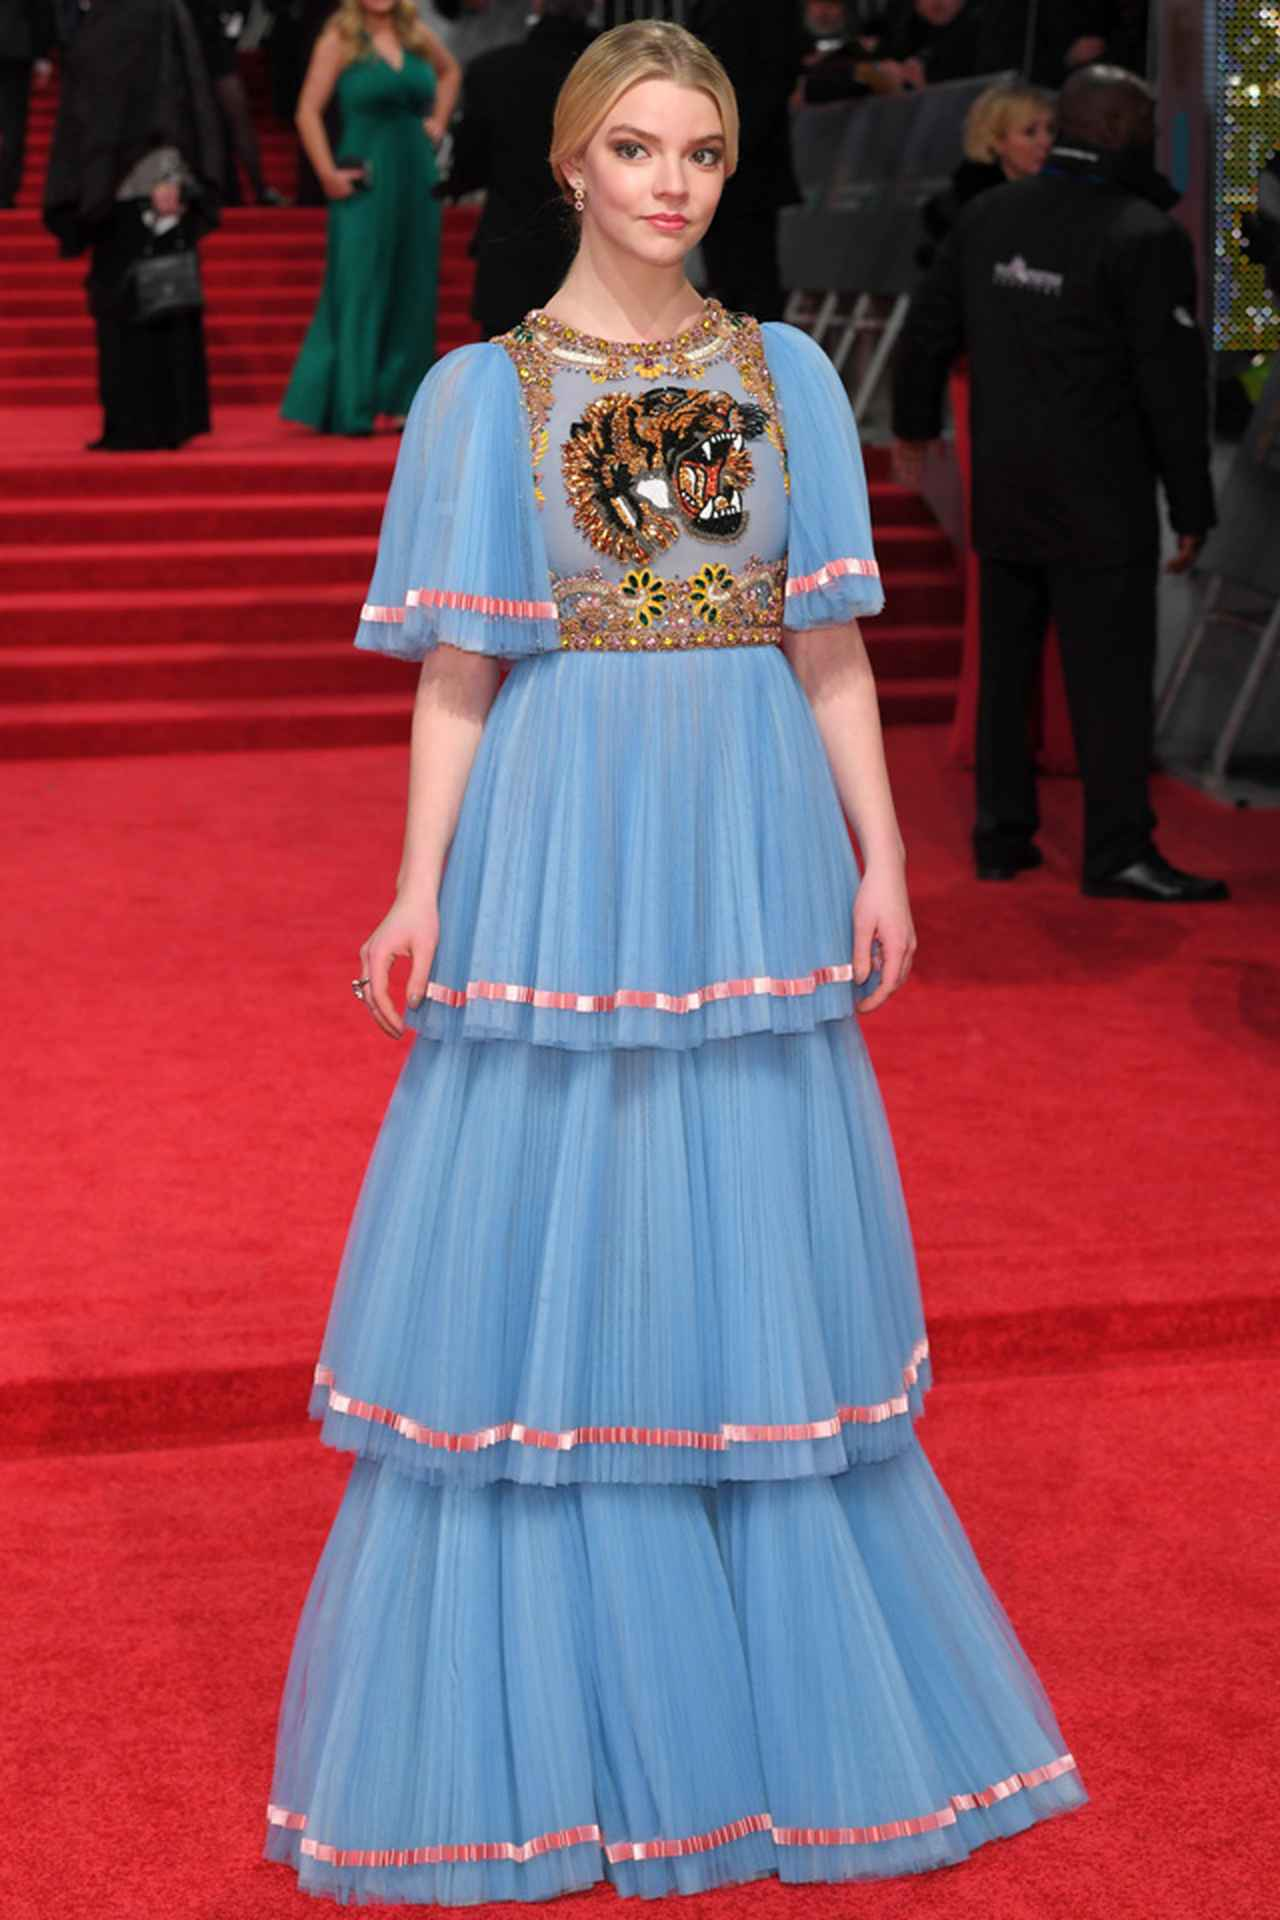 3b92c32c07f42 キャサリン妃も来場! 第70回英国アカデミー賞のレッドカーペットドレス ...